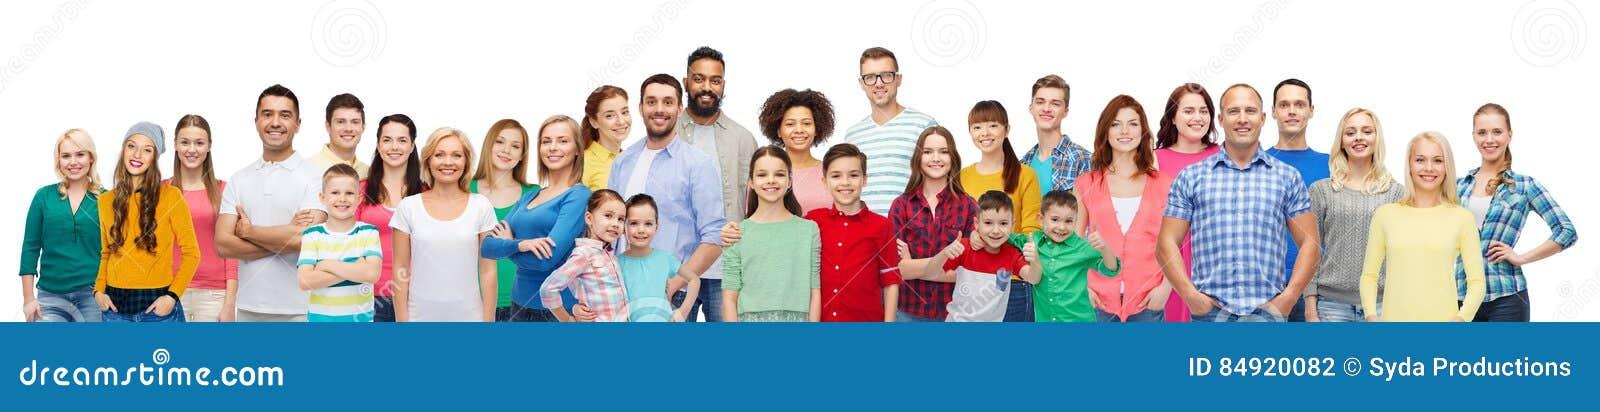 Grupo internacional de povos de sorriso felizes